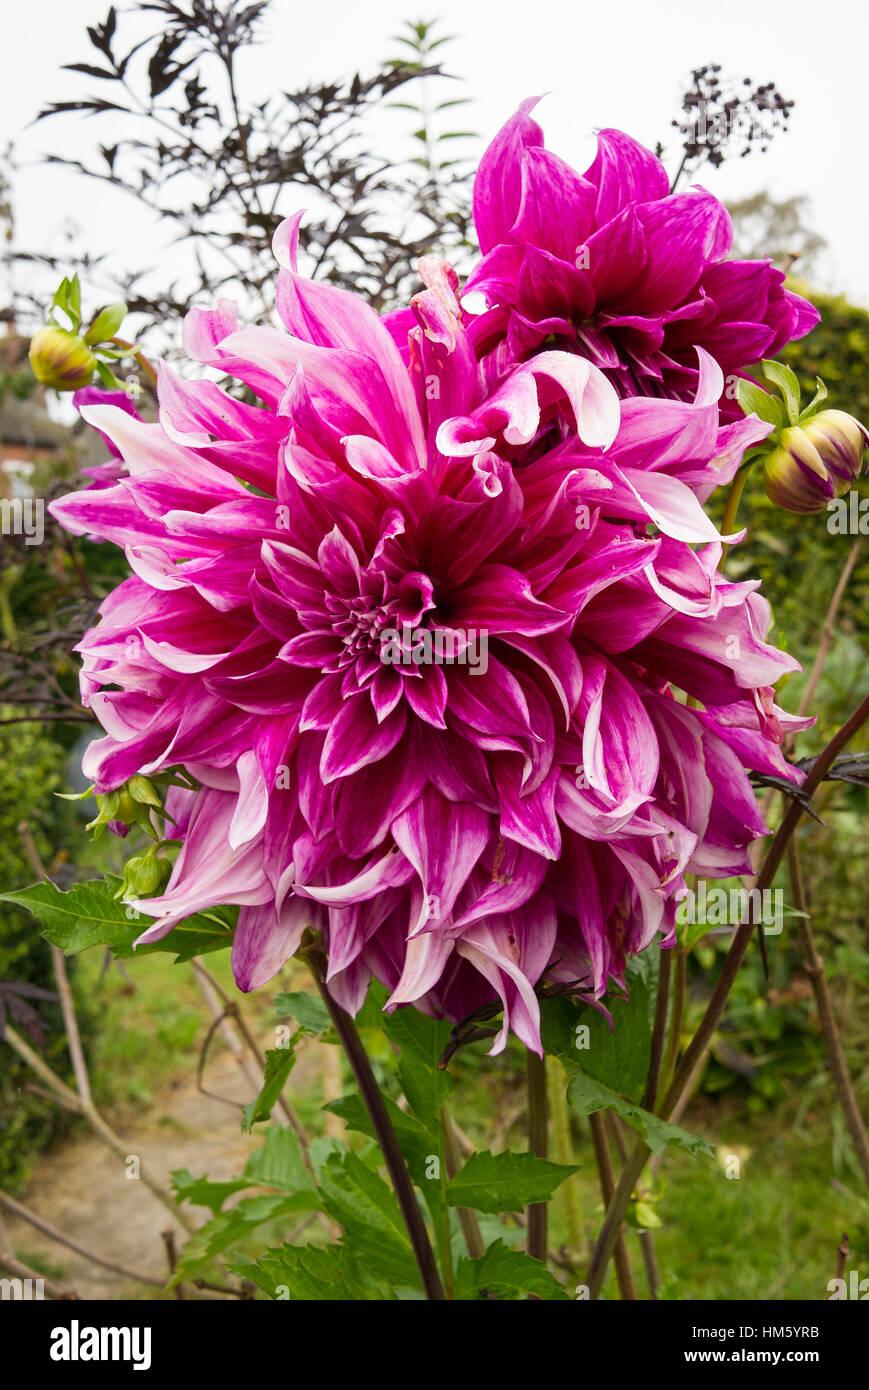 Dahlia Grande Finale flowering in October in the UK - Stock Image